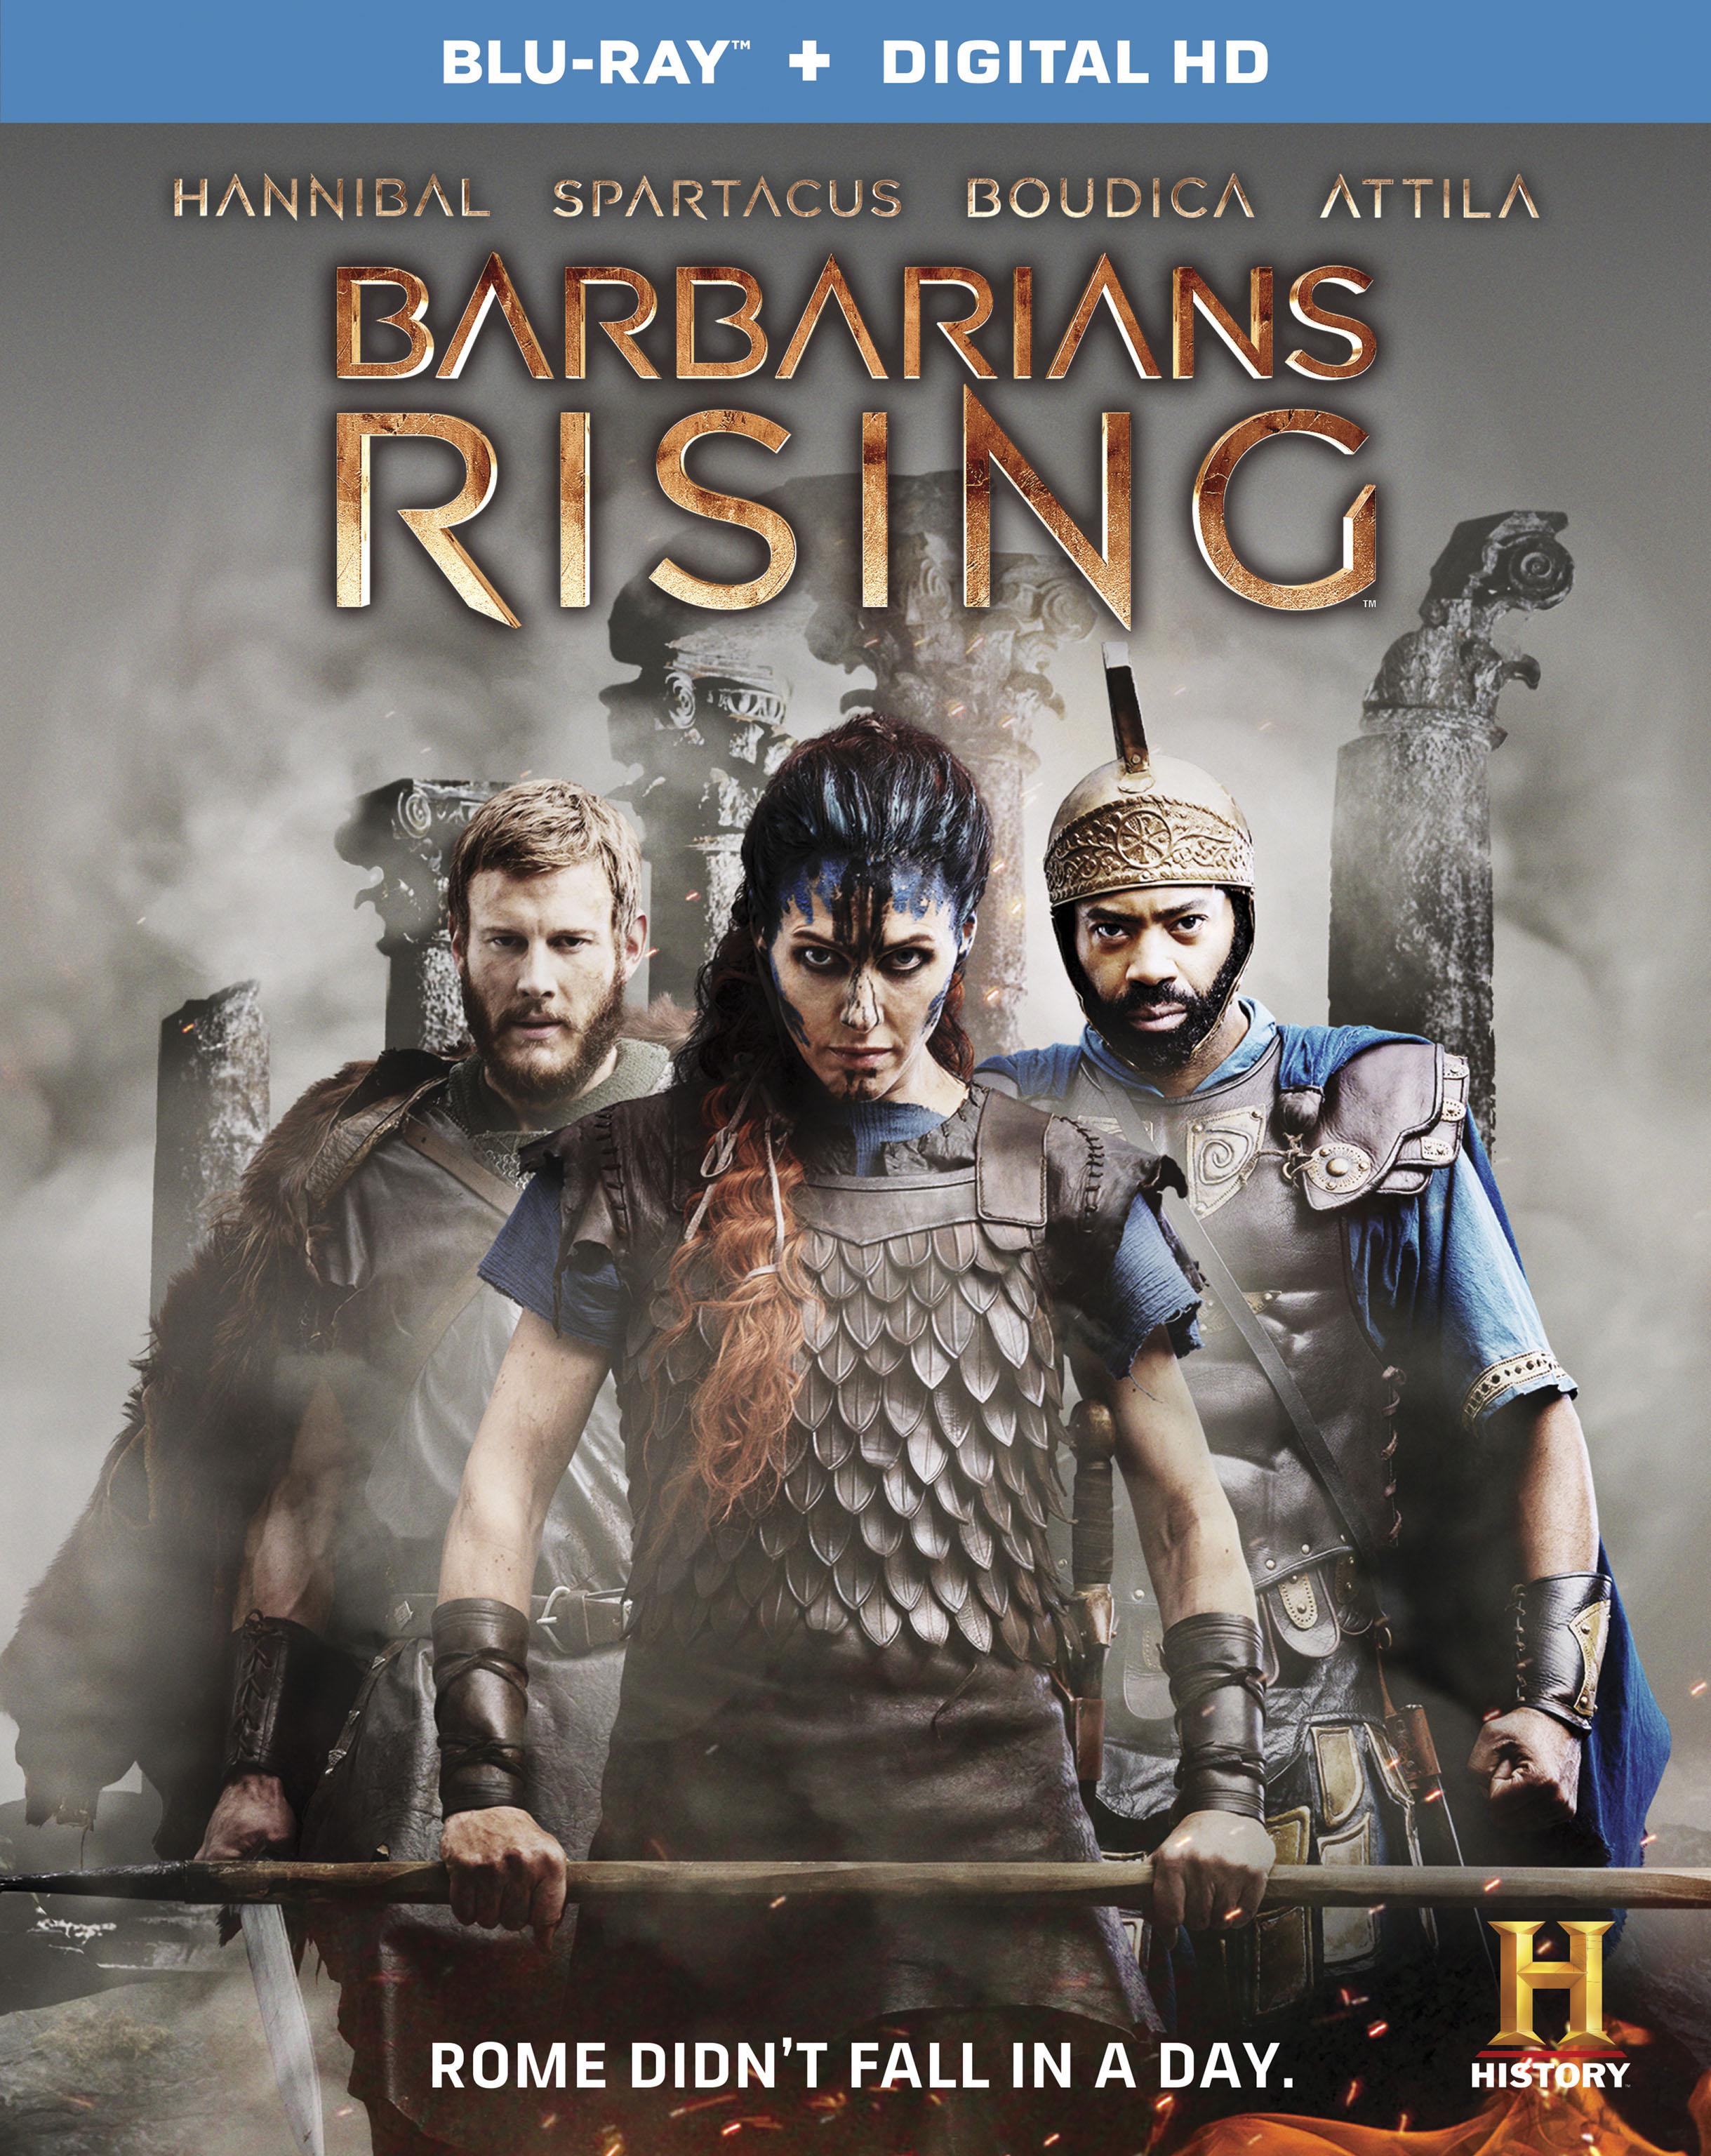 Barbarians Rising [blu-ray] [2 Discs] 5543108